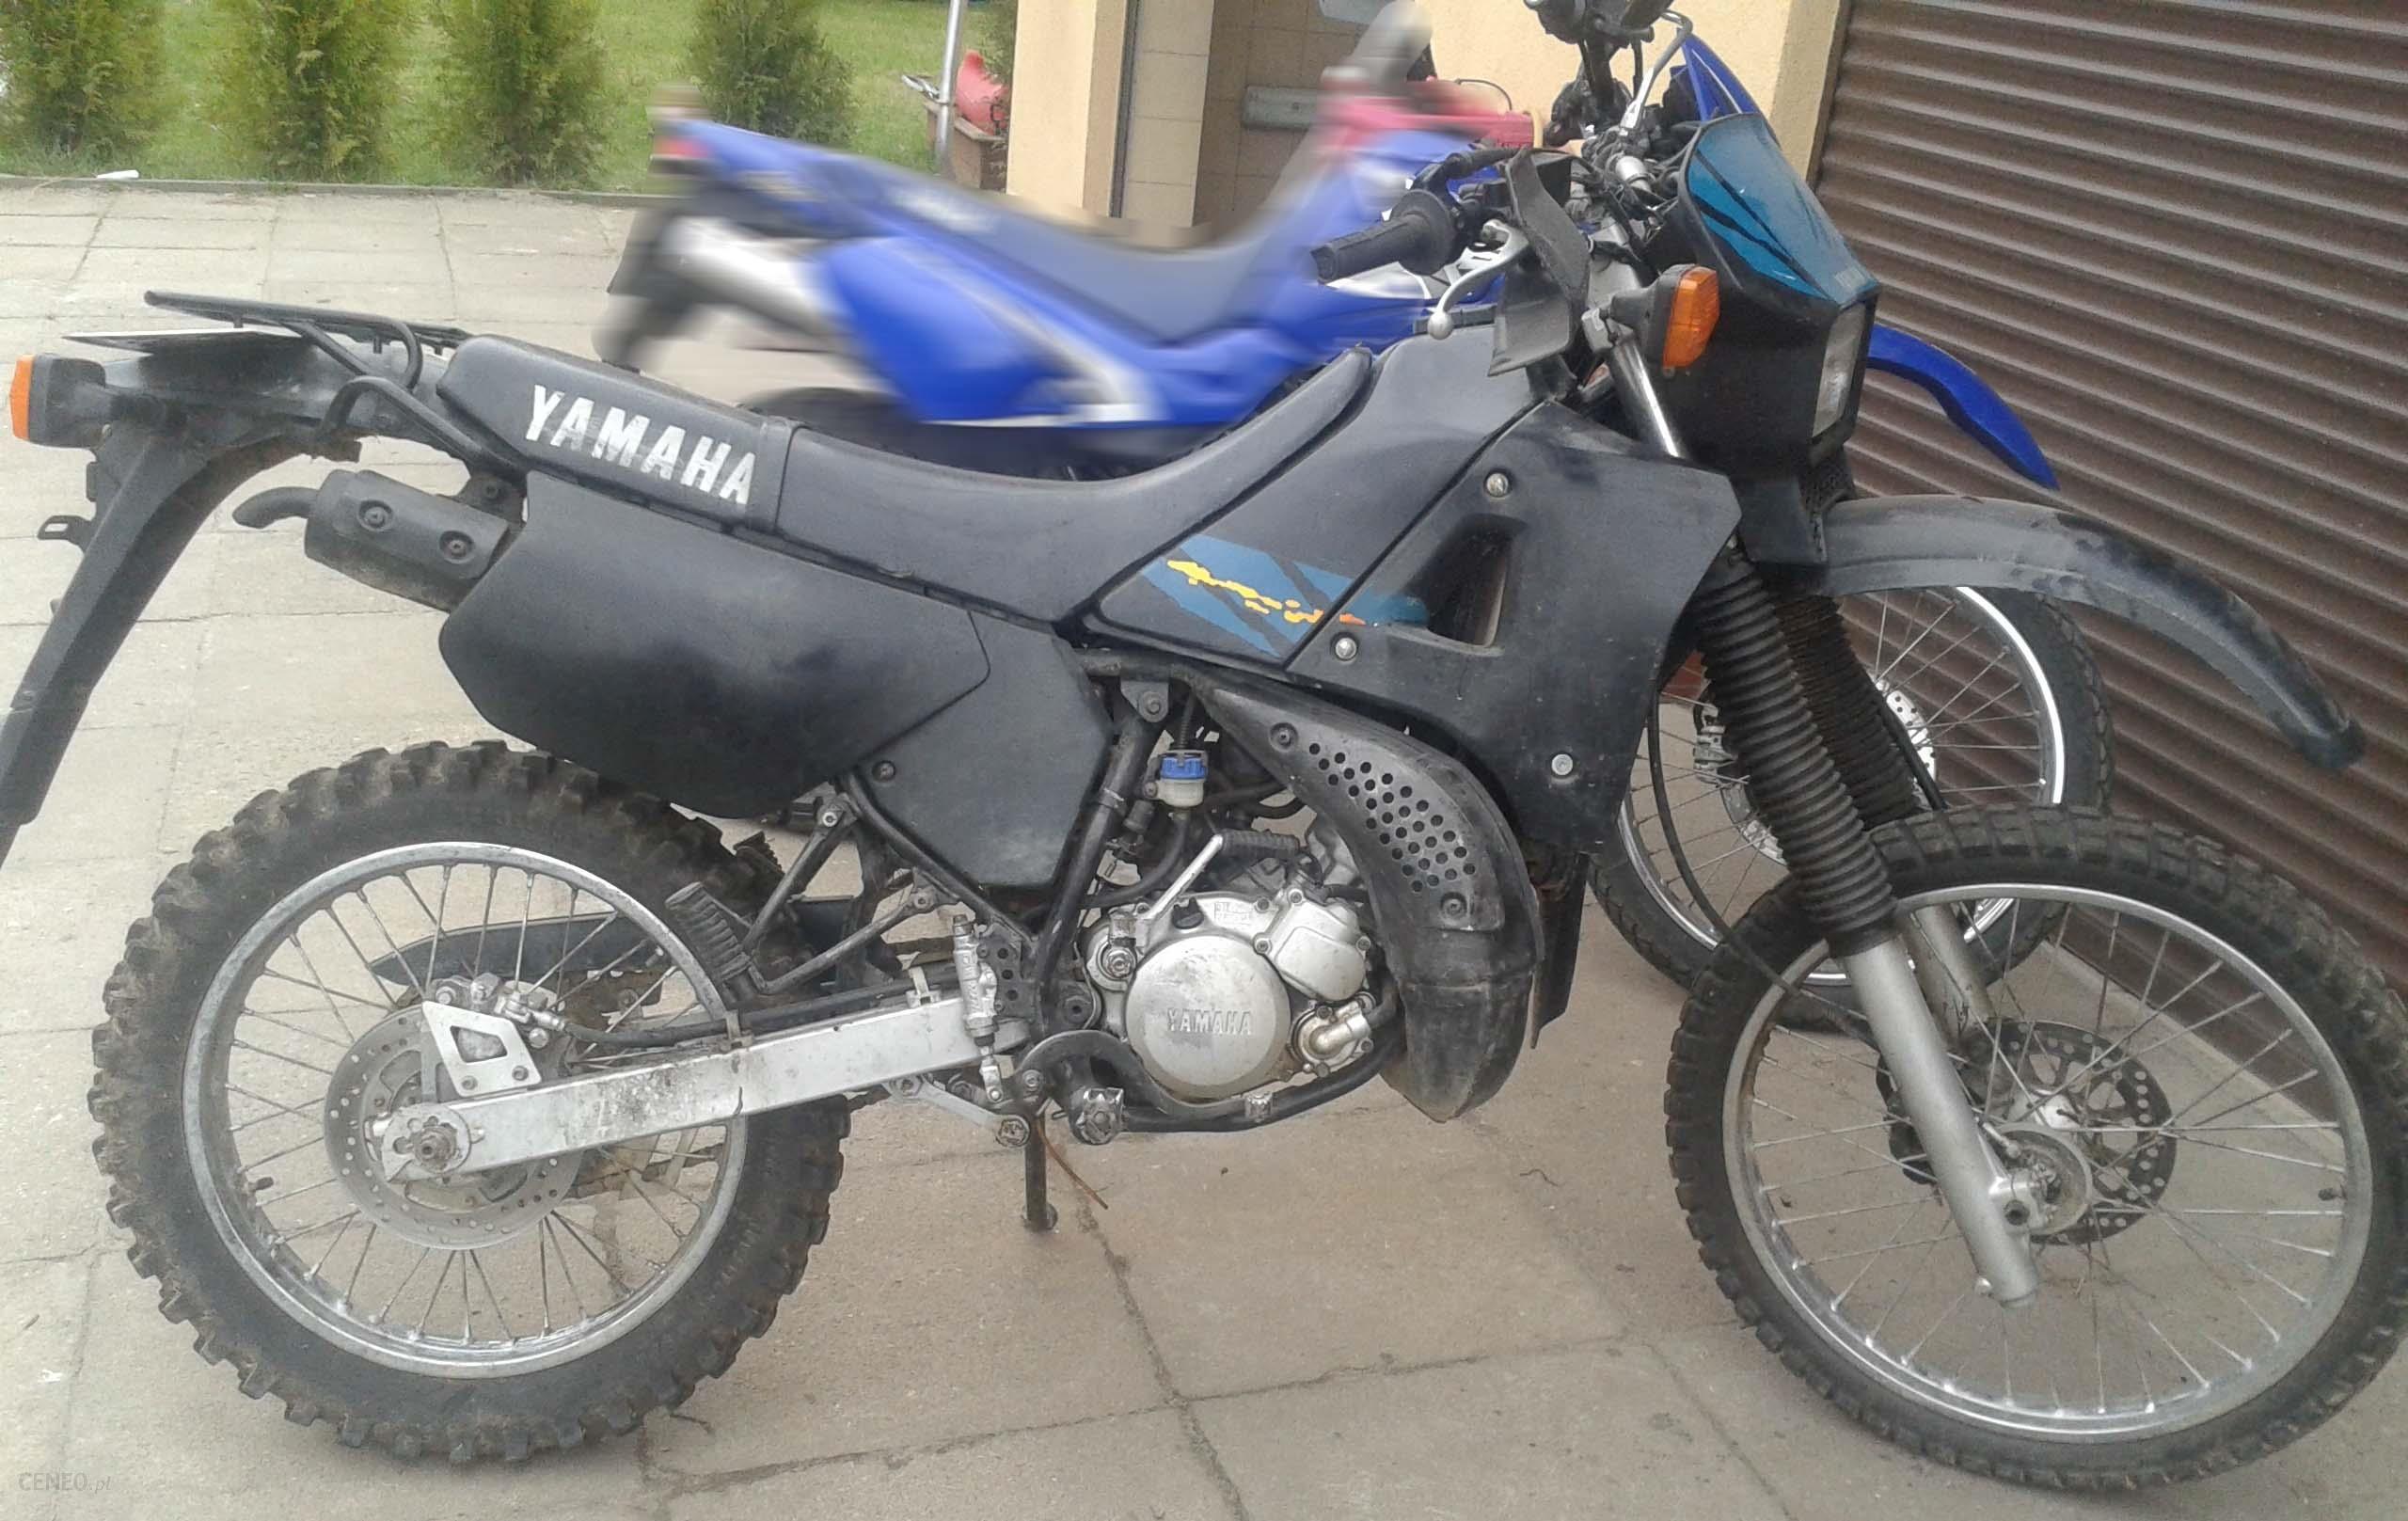 Yamaha Dt 125 R Opinie I Ceny Na Ceneo Pl